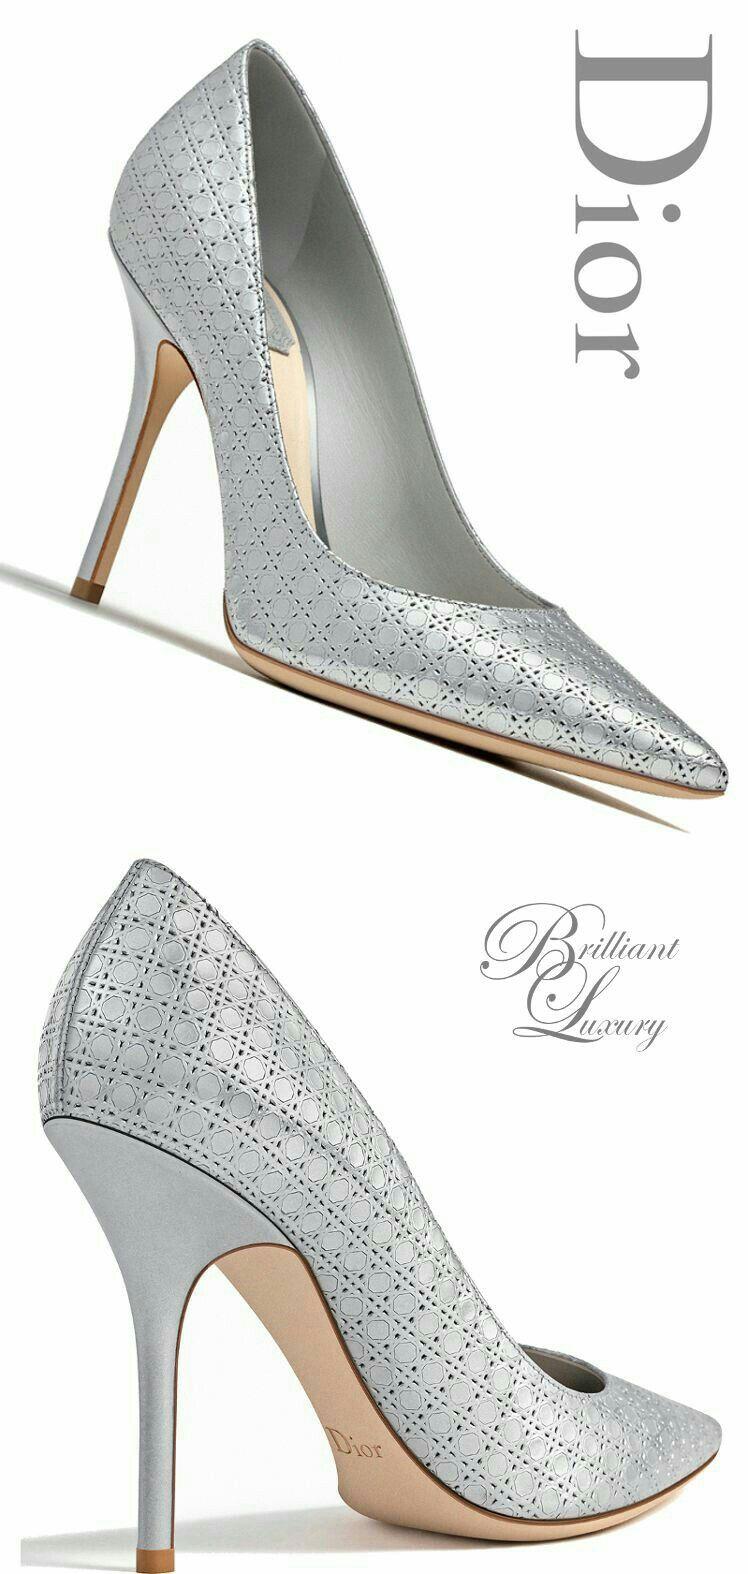 Silver is for queens | Heels, High